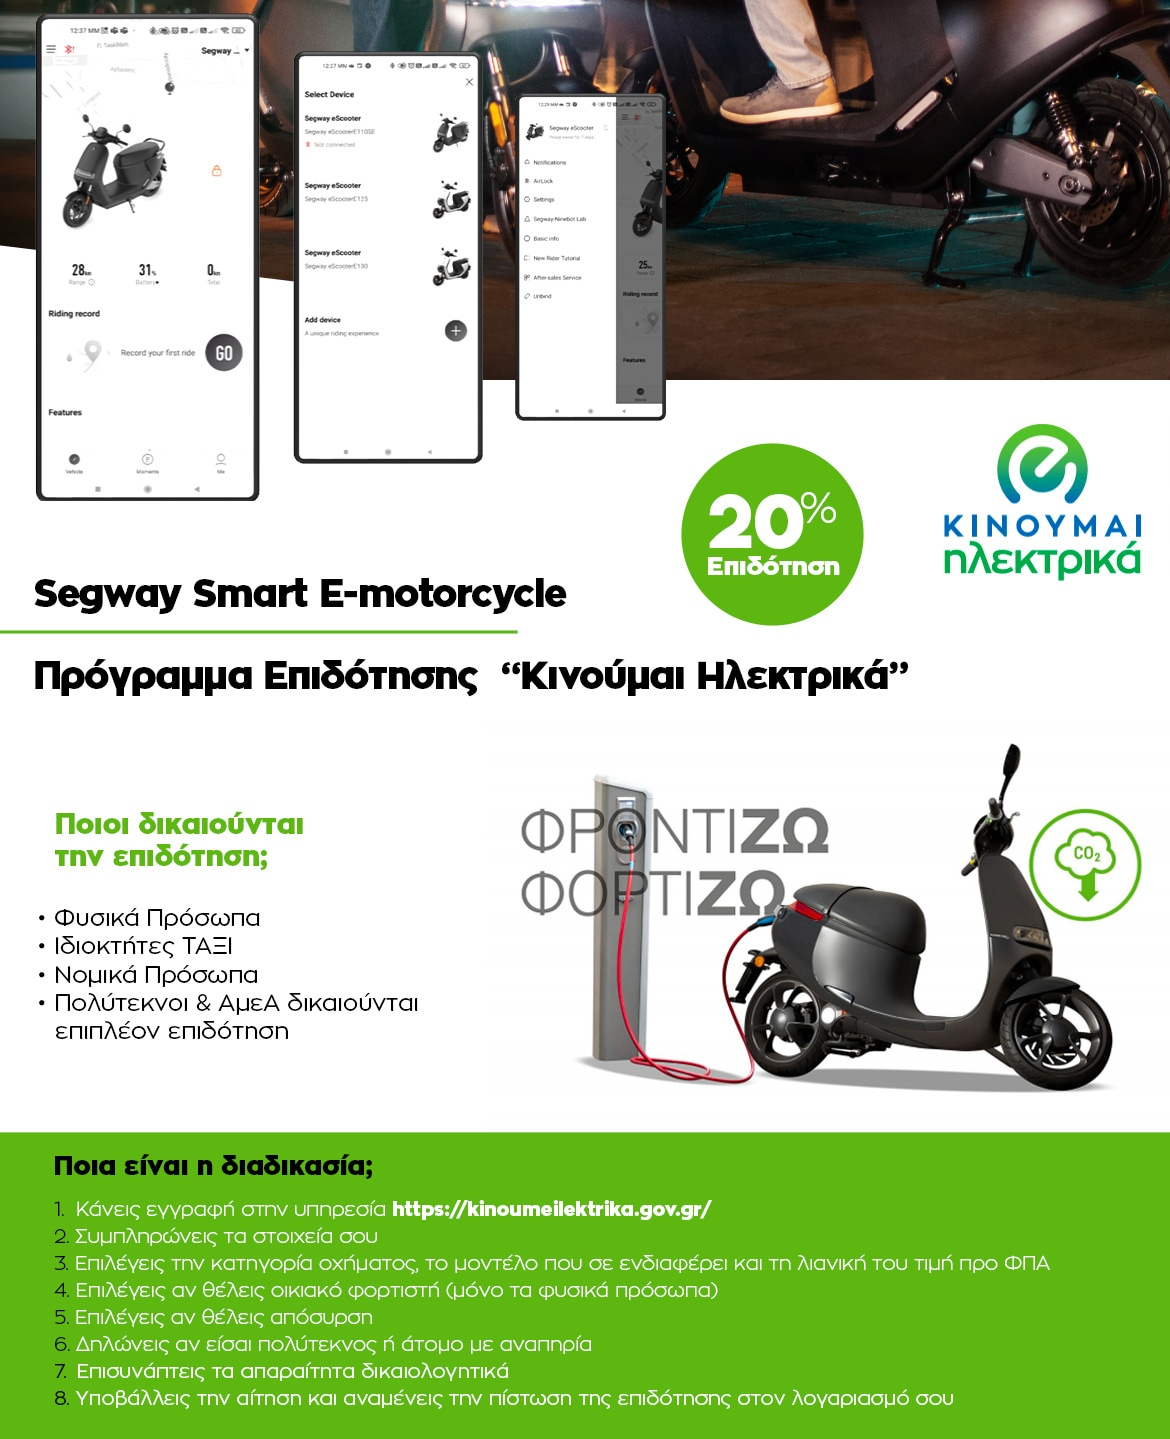 Segway Smart e-motrocycle - 20% επιδότηση στο πρόγραμμα Κινούμαι Ηλεκτρικά - Διαδικασία